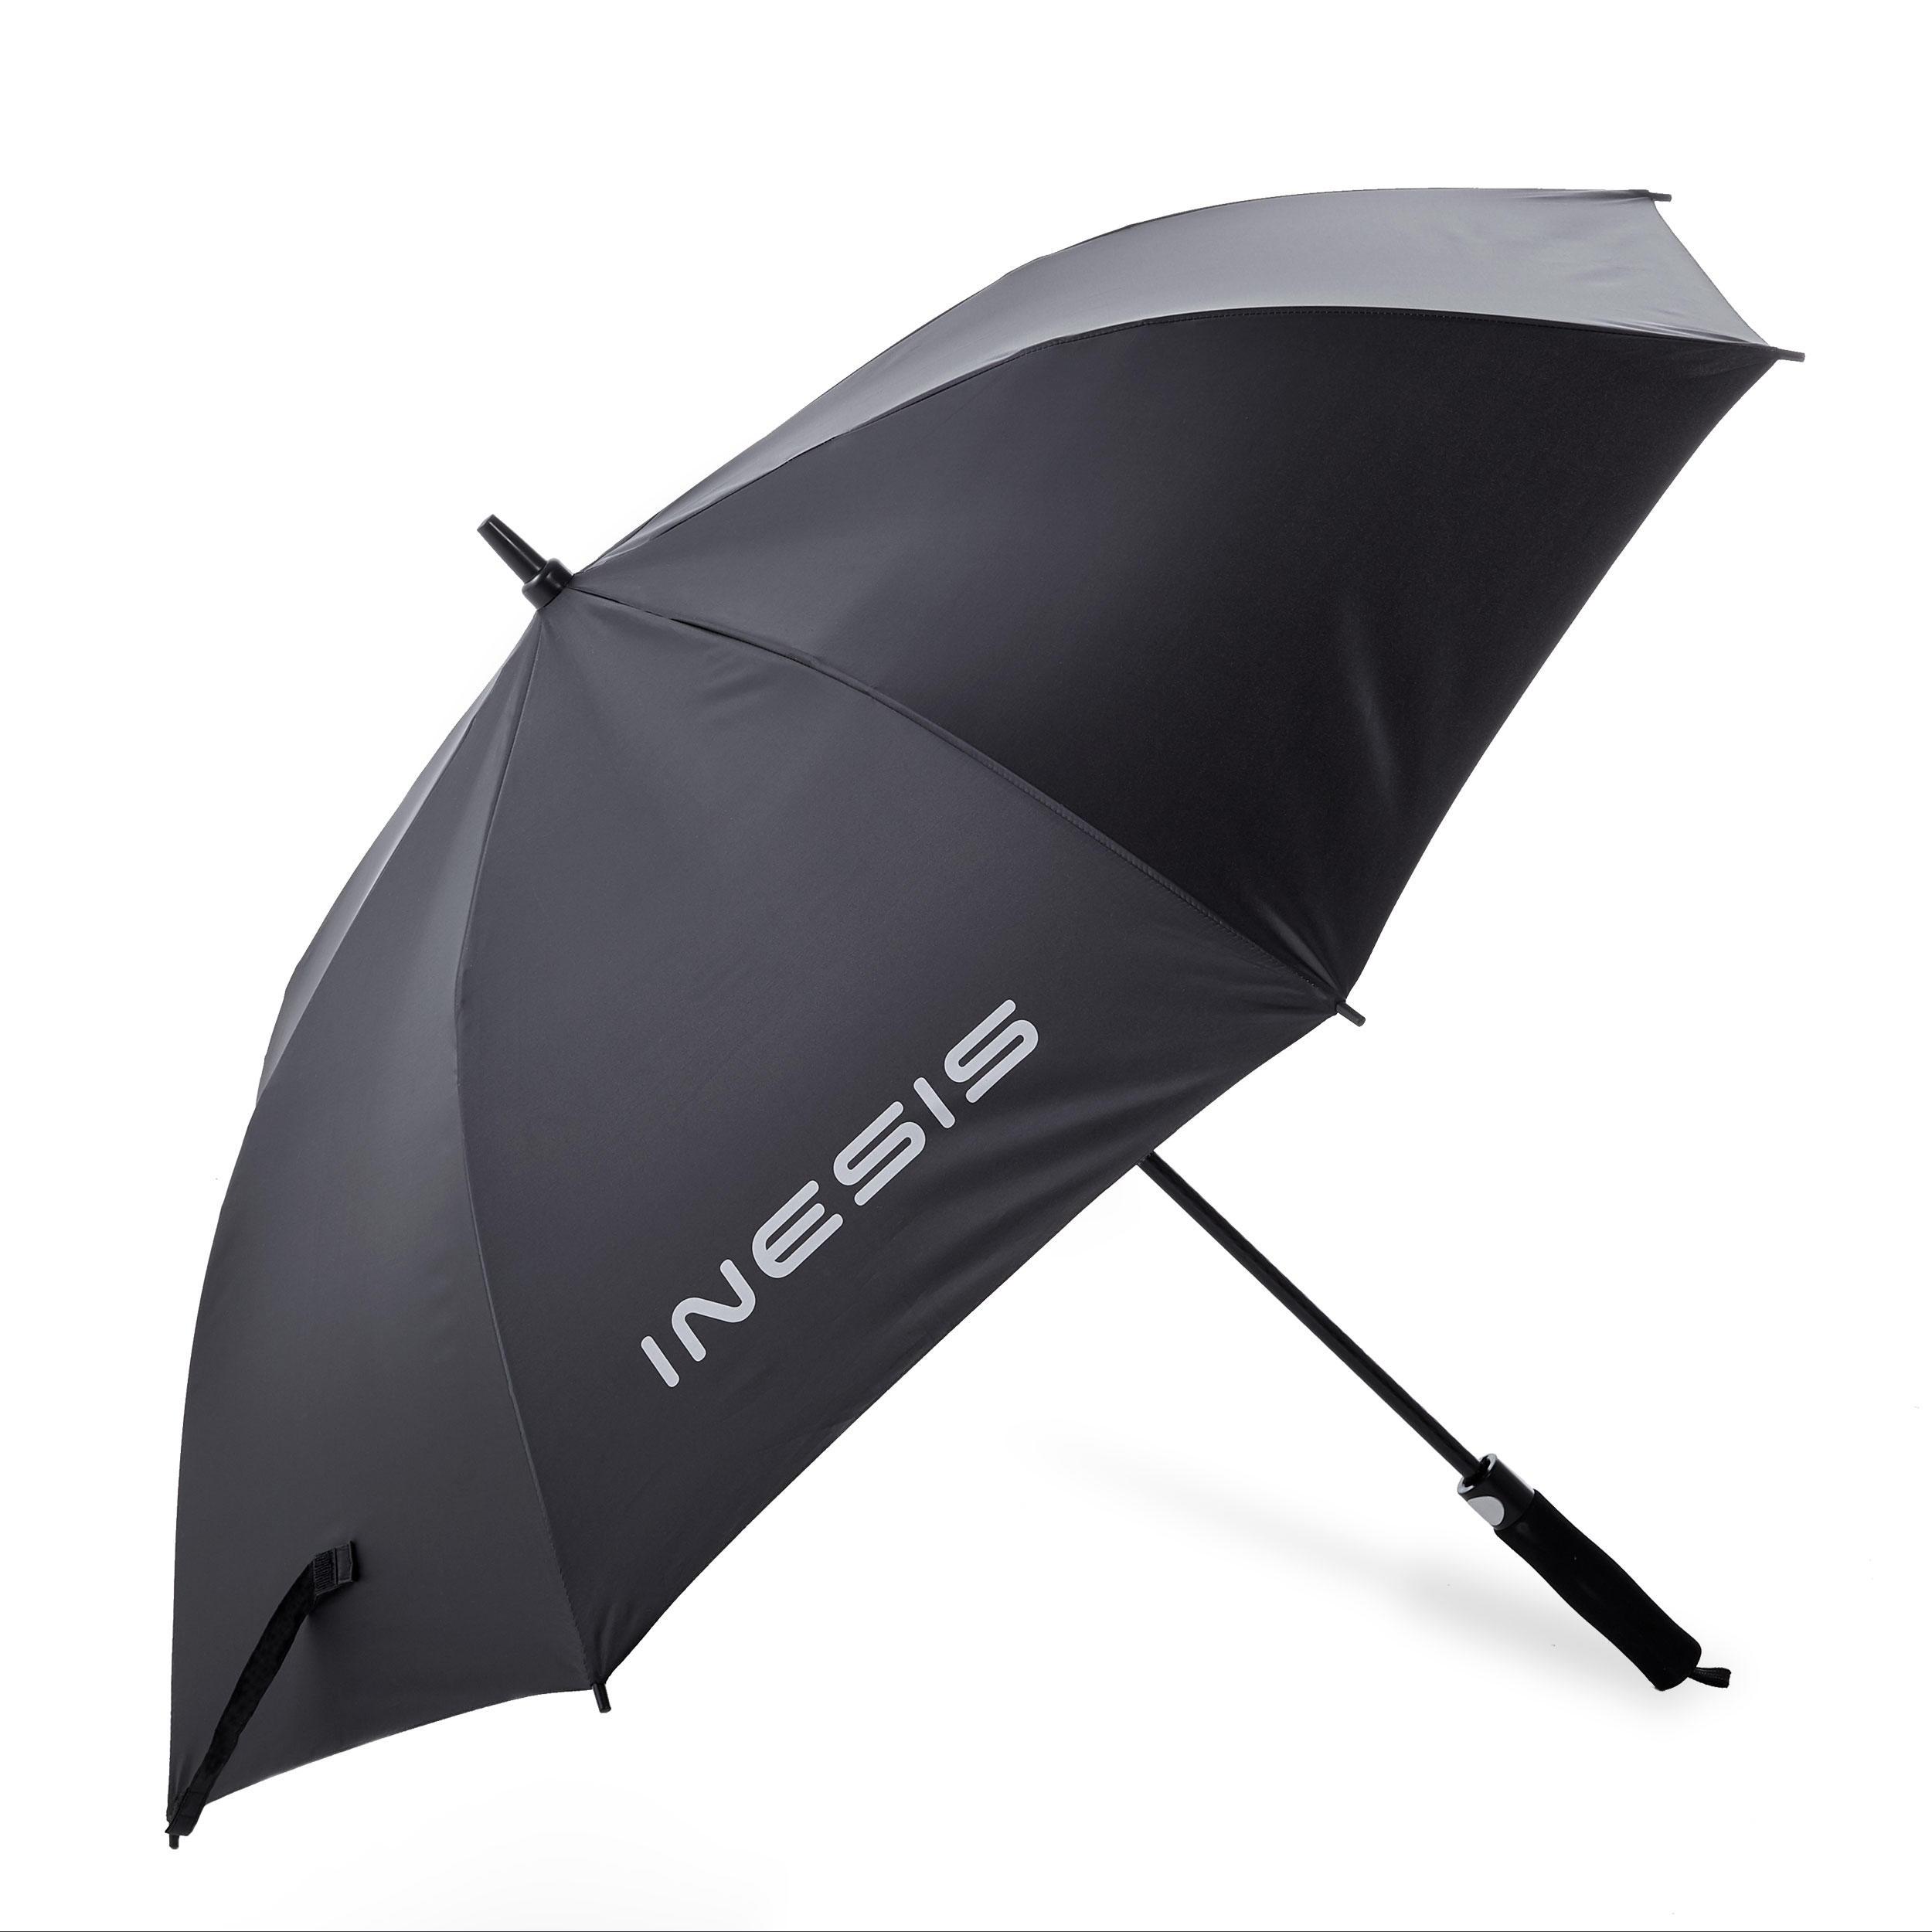 Golf Regenschirm ProFilter Medium   Accessoires > Regenschirme > Sonstige Regenschirme   Inesis